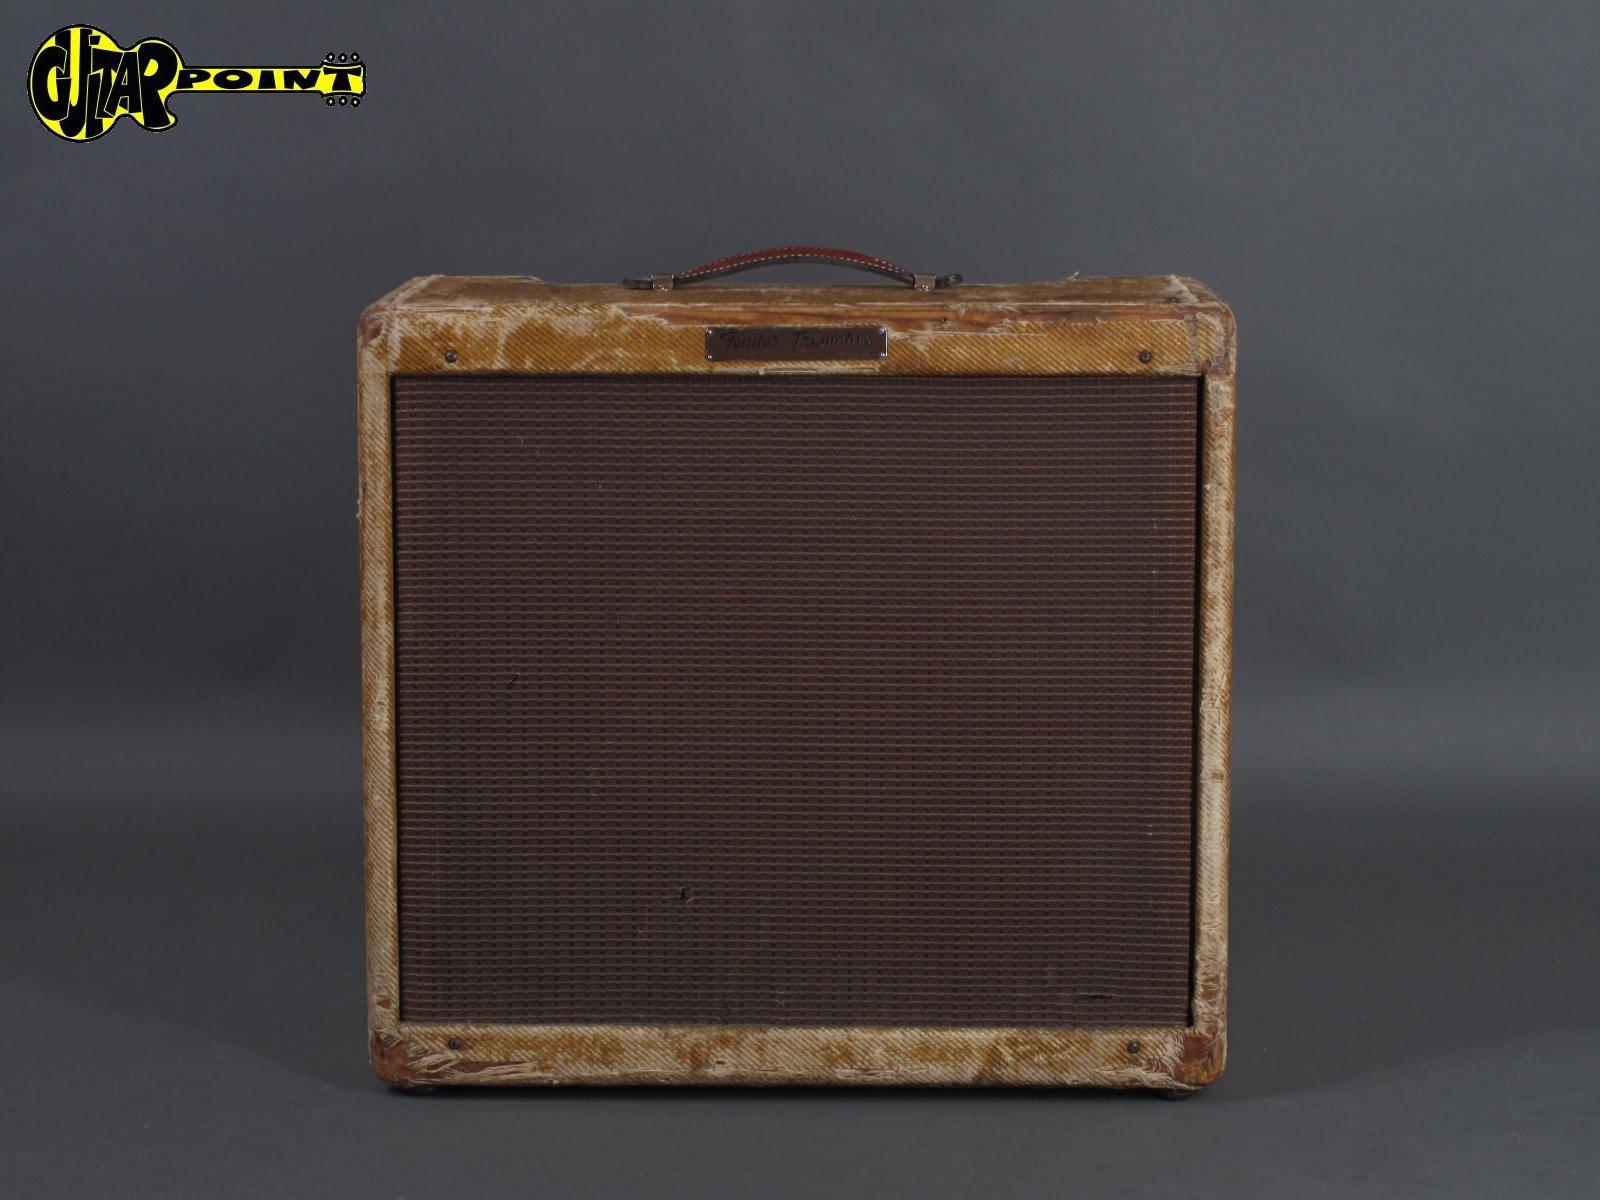 1956 Fender Tremolux - Tweed / Narrow Panel